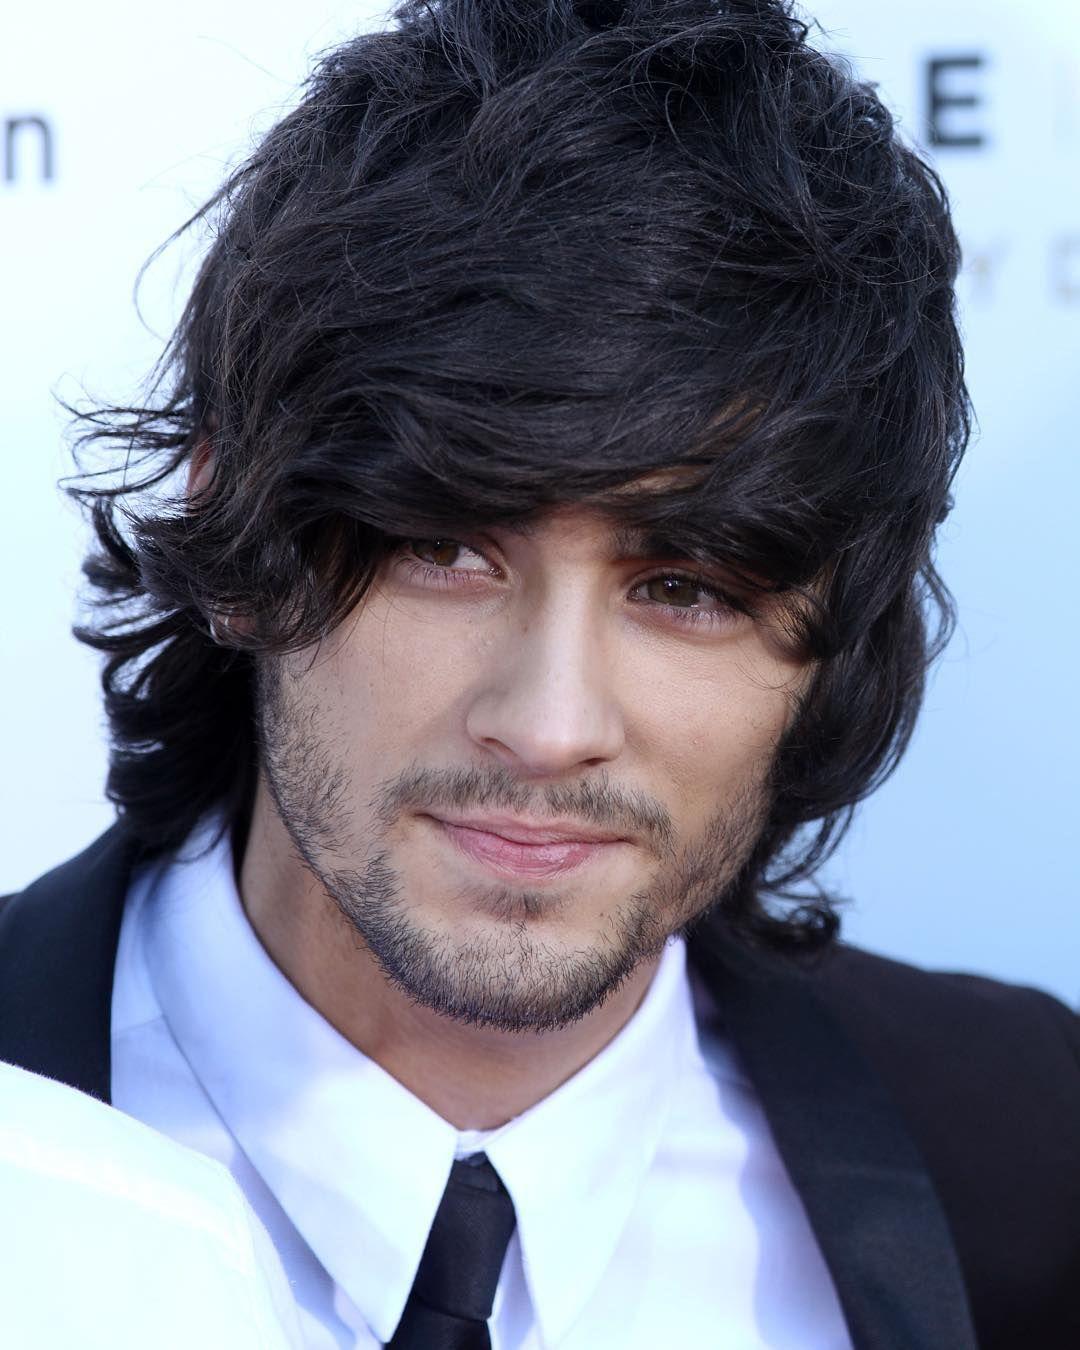 Cool 30 Incredible Zayn Malik Haircut Styles All His Favorite